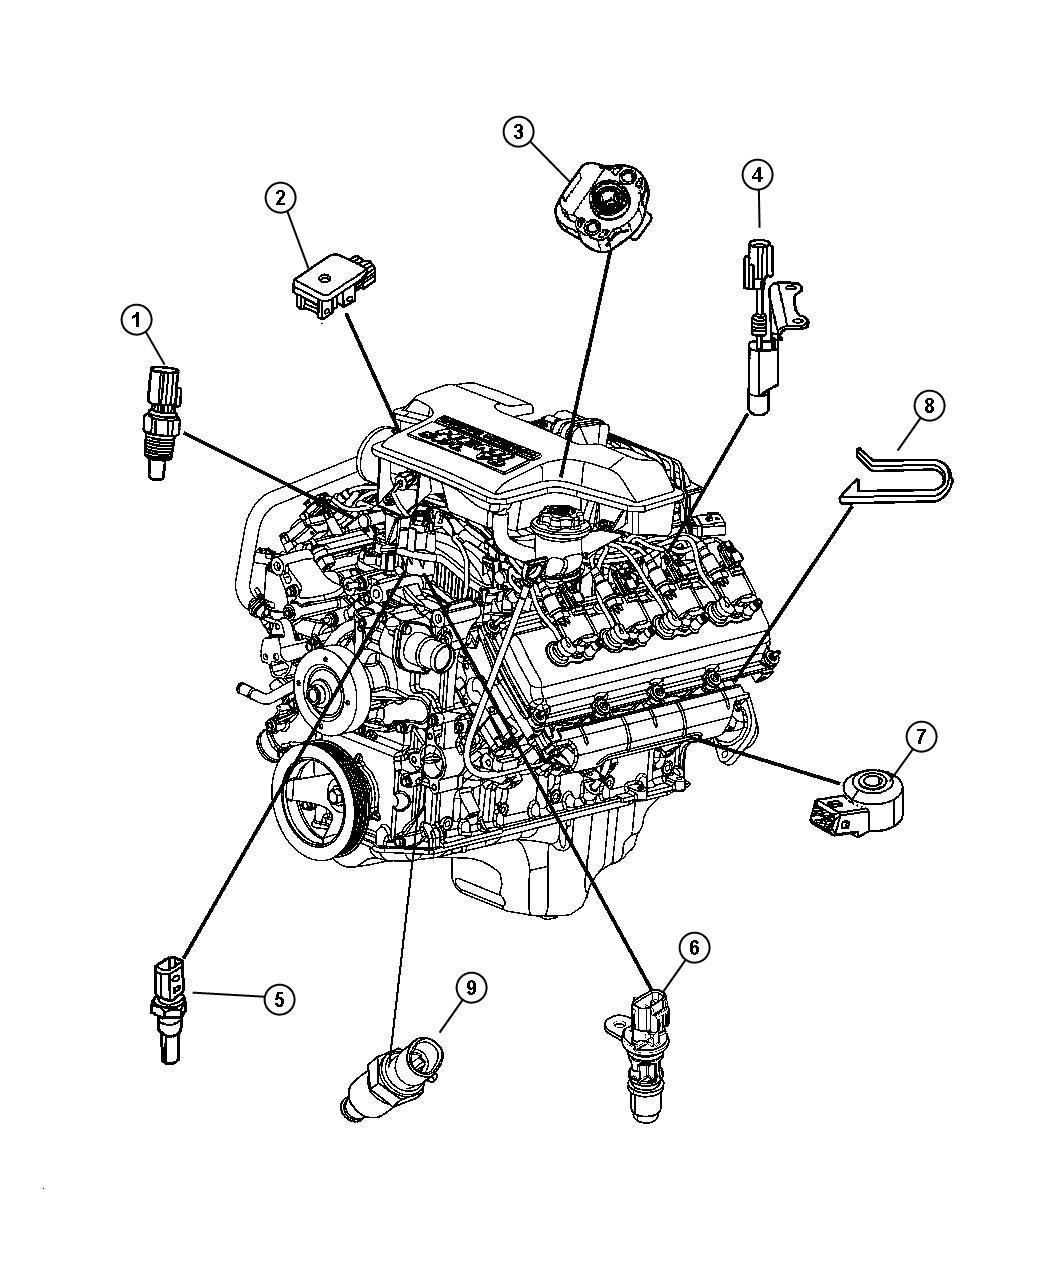 YF_9985] Hemi 5 7 Engine Wiring Diagram Wiring DiagramTarg Eumqu Embo Vish Ungo Sapebe Mohammedshrine Librar Wiring 101